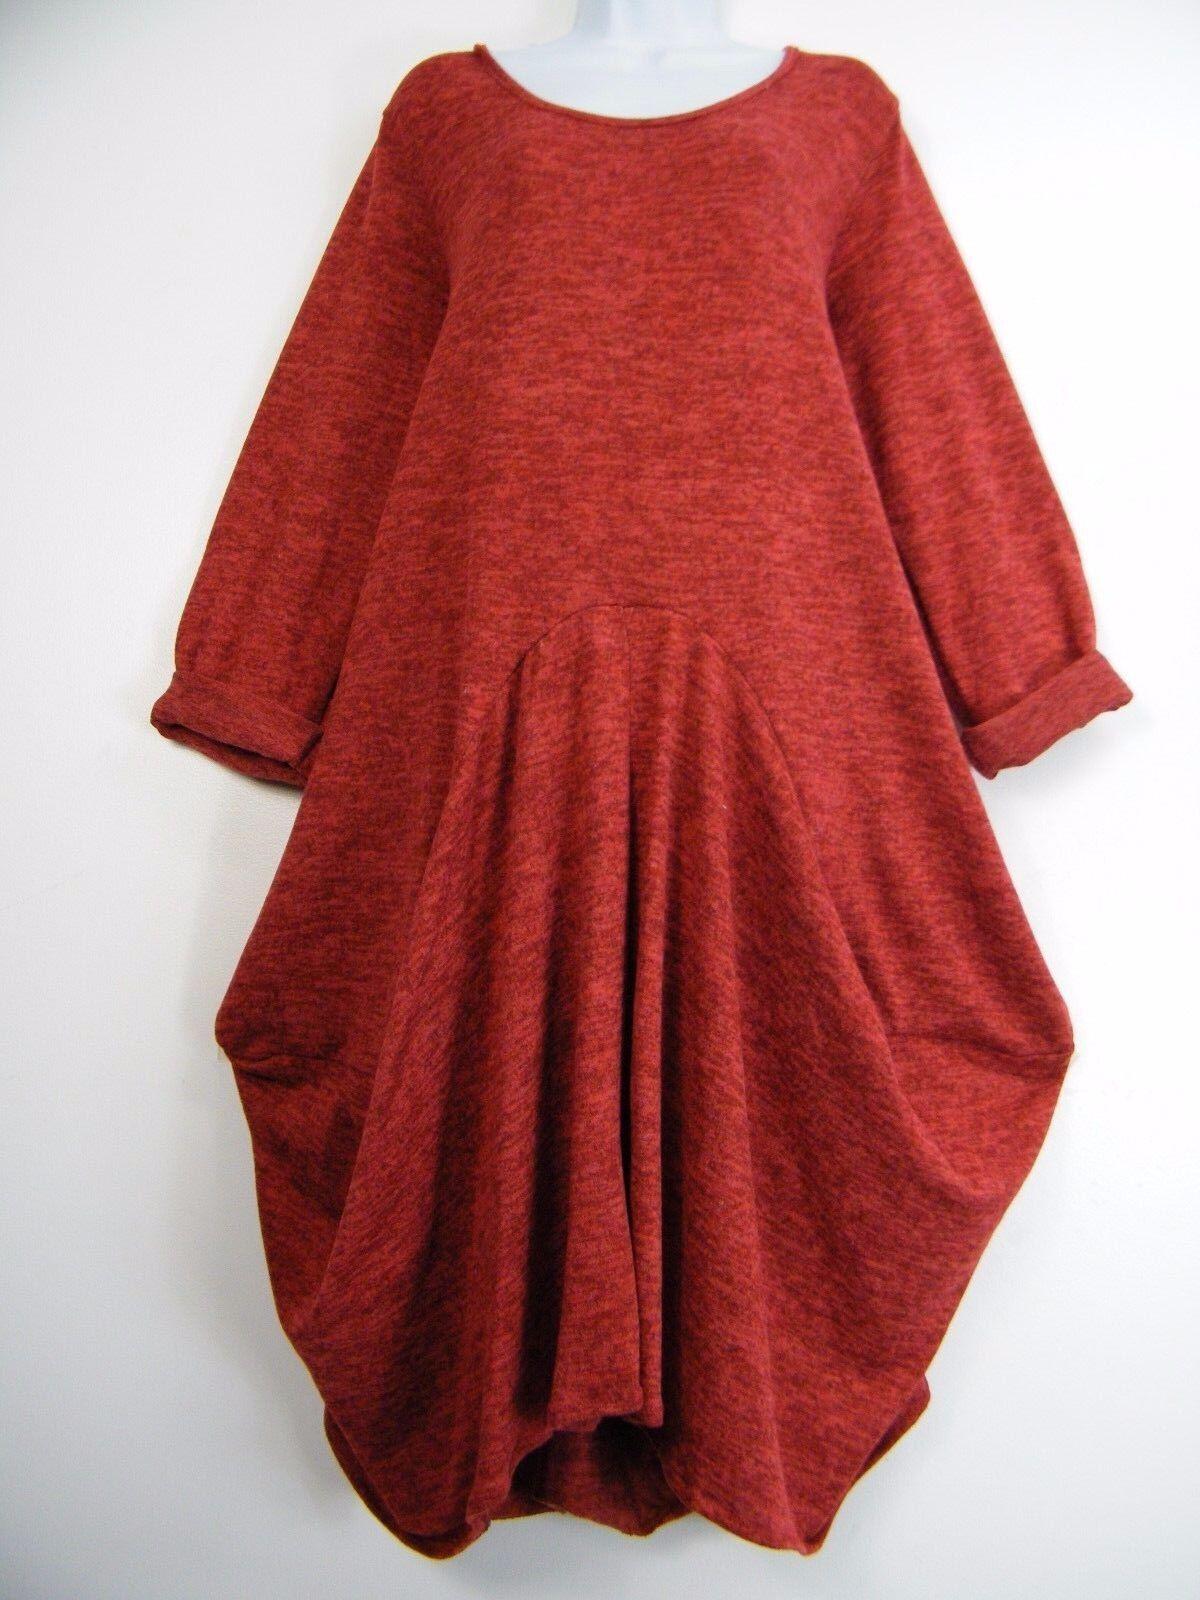 LAGEN LOOK AUTUMN WINTER DRESS POLY VISCO MIX 8 COLS PLUS SIZE TO FIT SIZE16-20